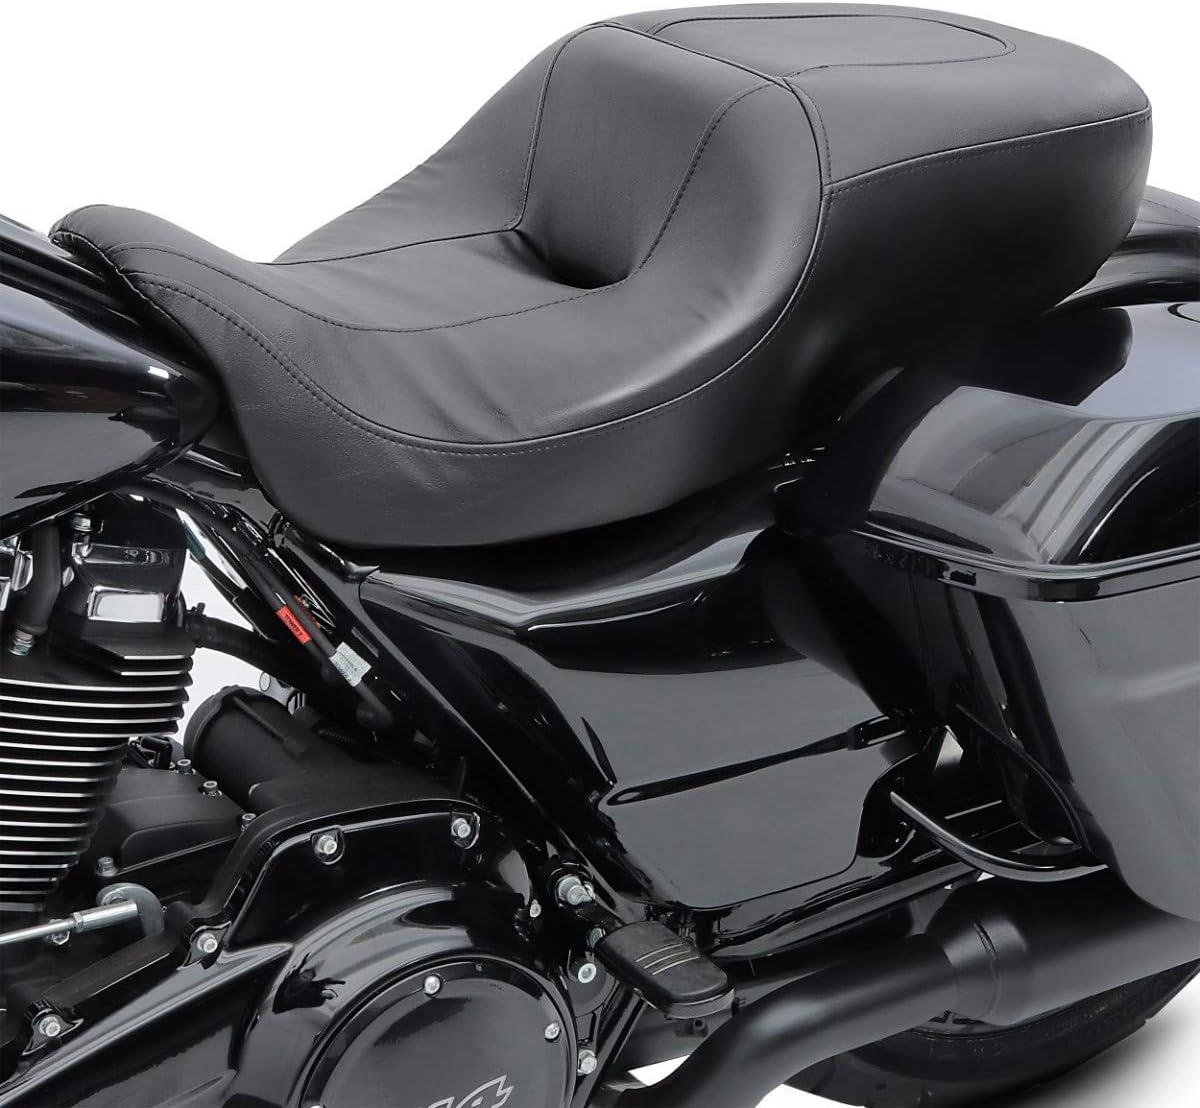 Sella comfort per Harley Davidson Electra Glide Ultra Classic 14-20 Hammock